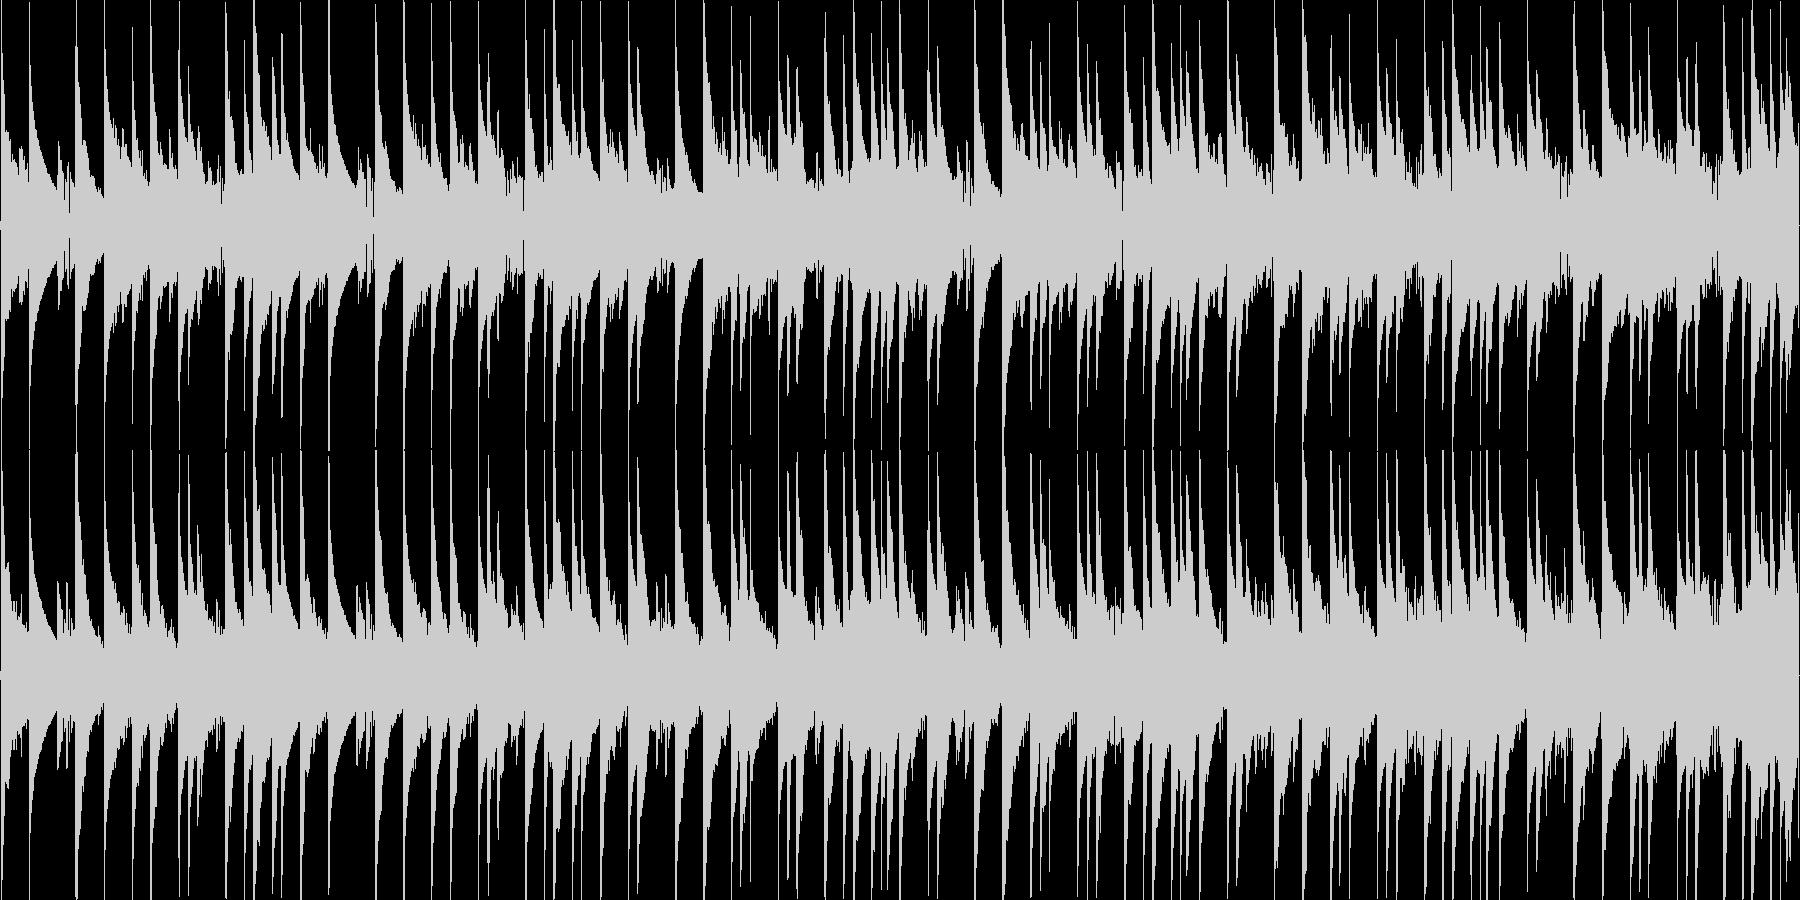 8bitチューンのRPG風フィールド用1の未再生の波形